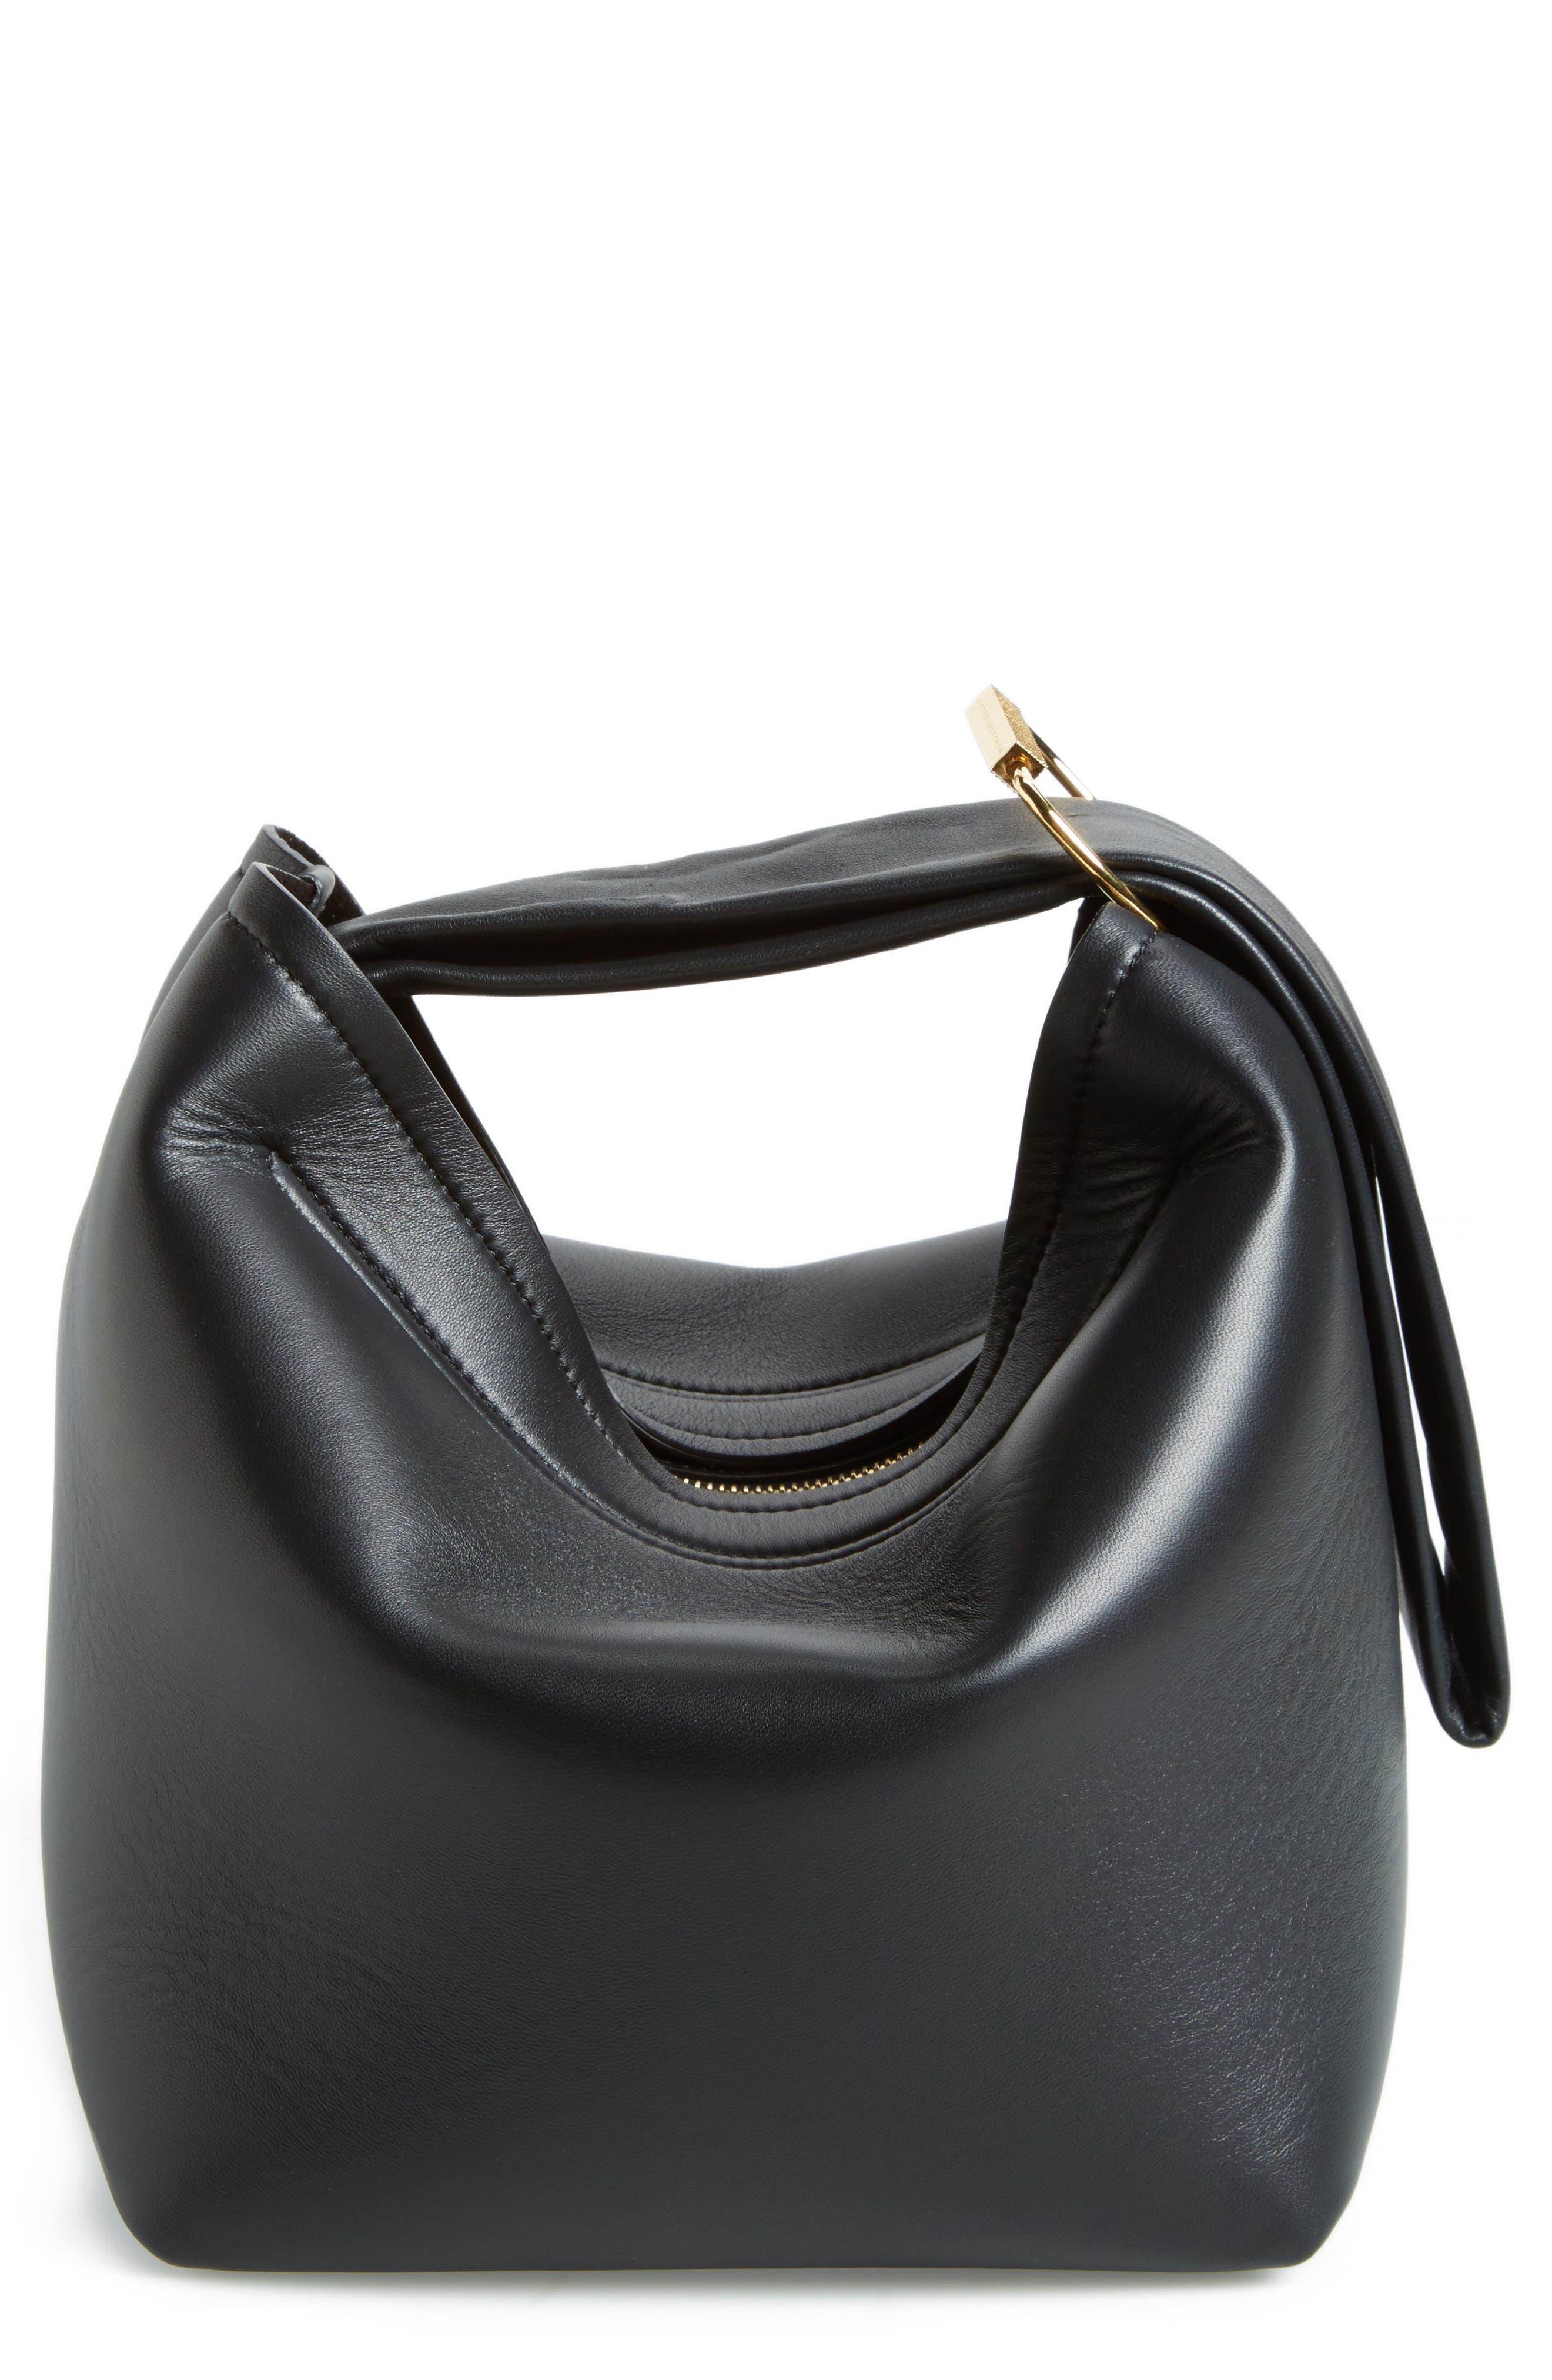 Victoria Beckham Tissue Pouch Leather Bag